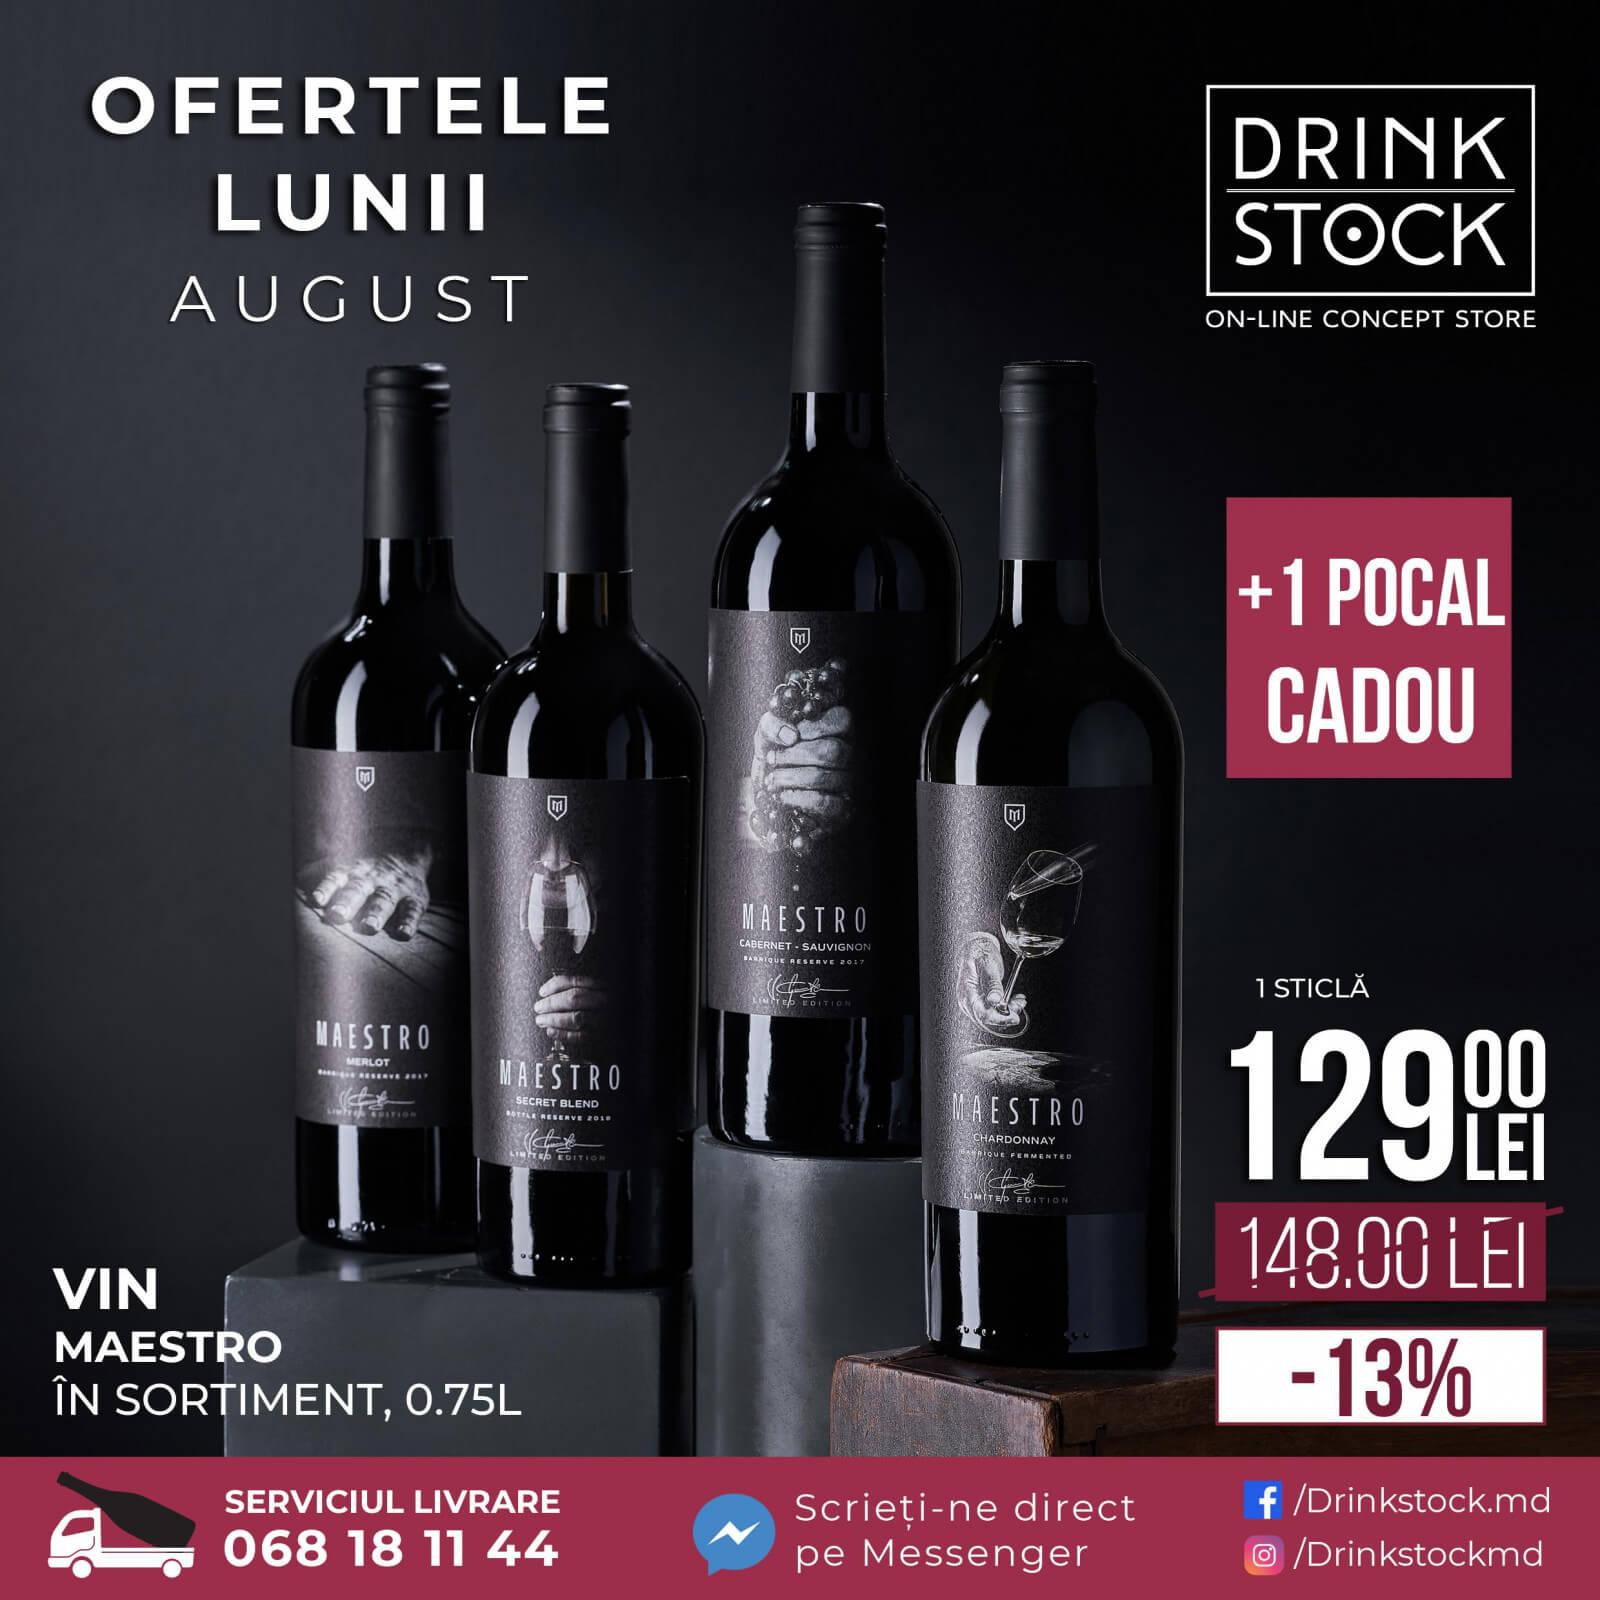 DrinkStock - Oferta lunii august